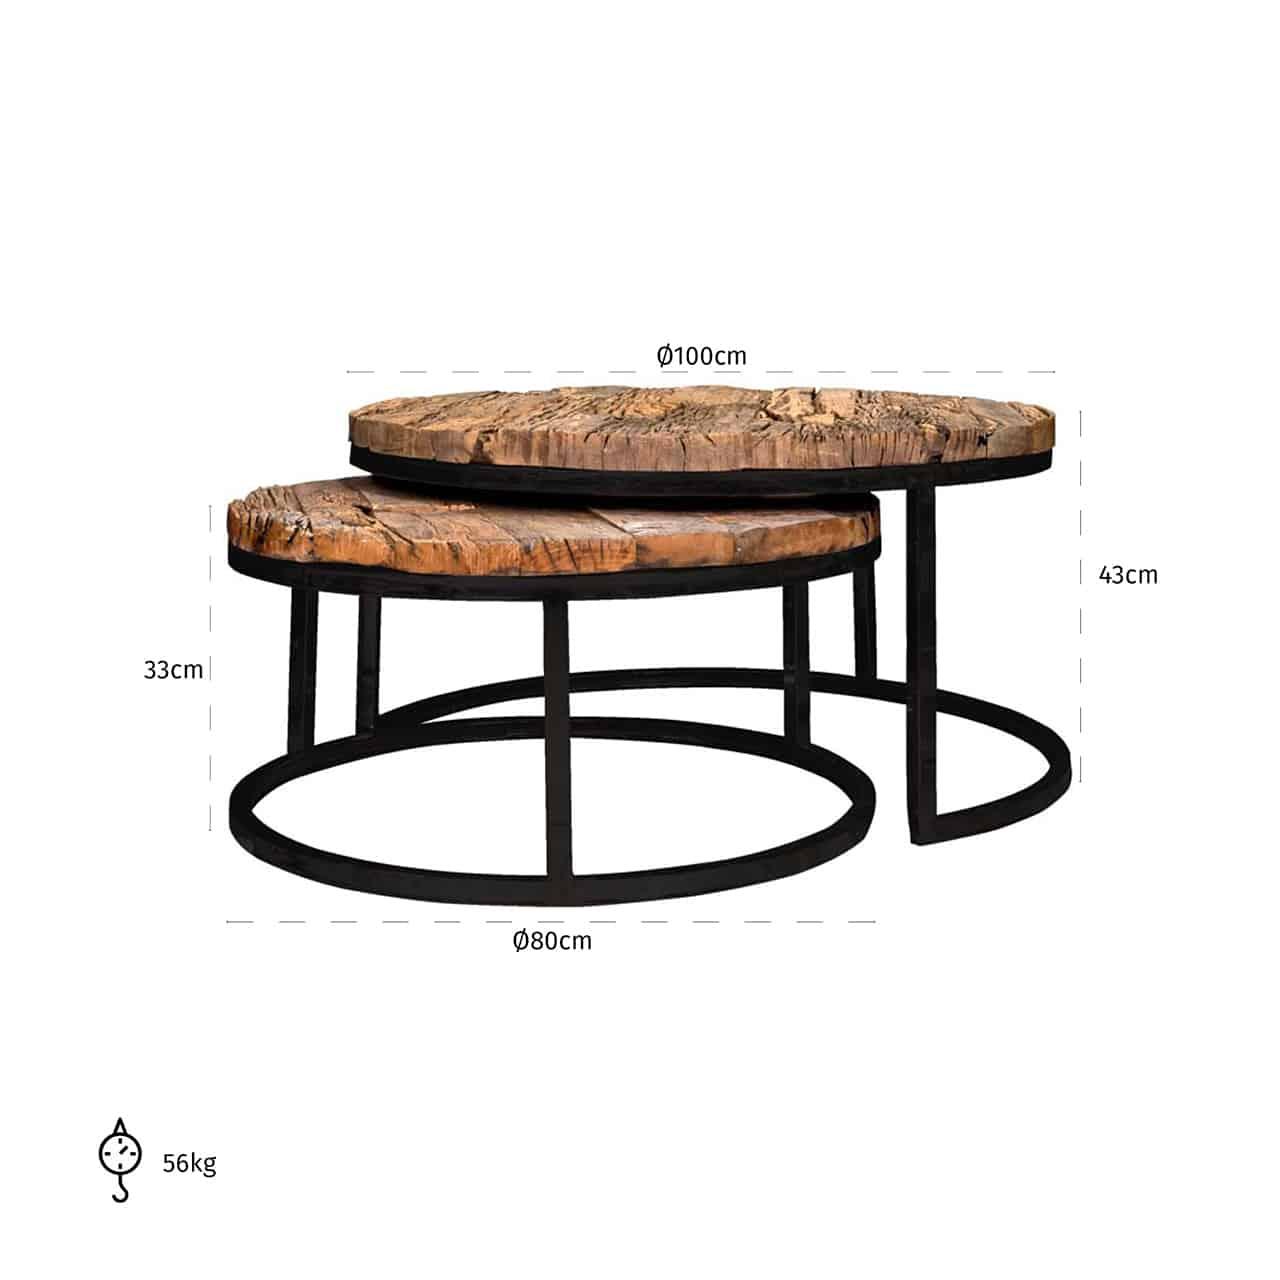 Tables Gigognes Richmond Interiors Plateau Rond Bois Pied